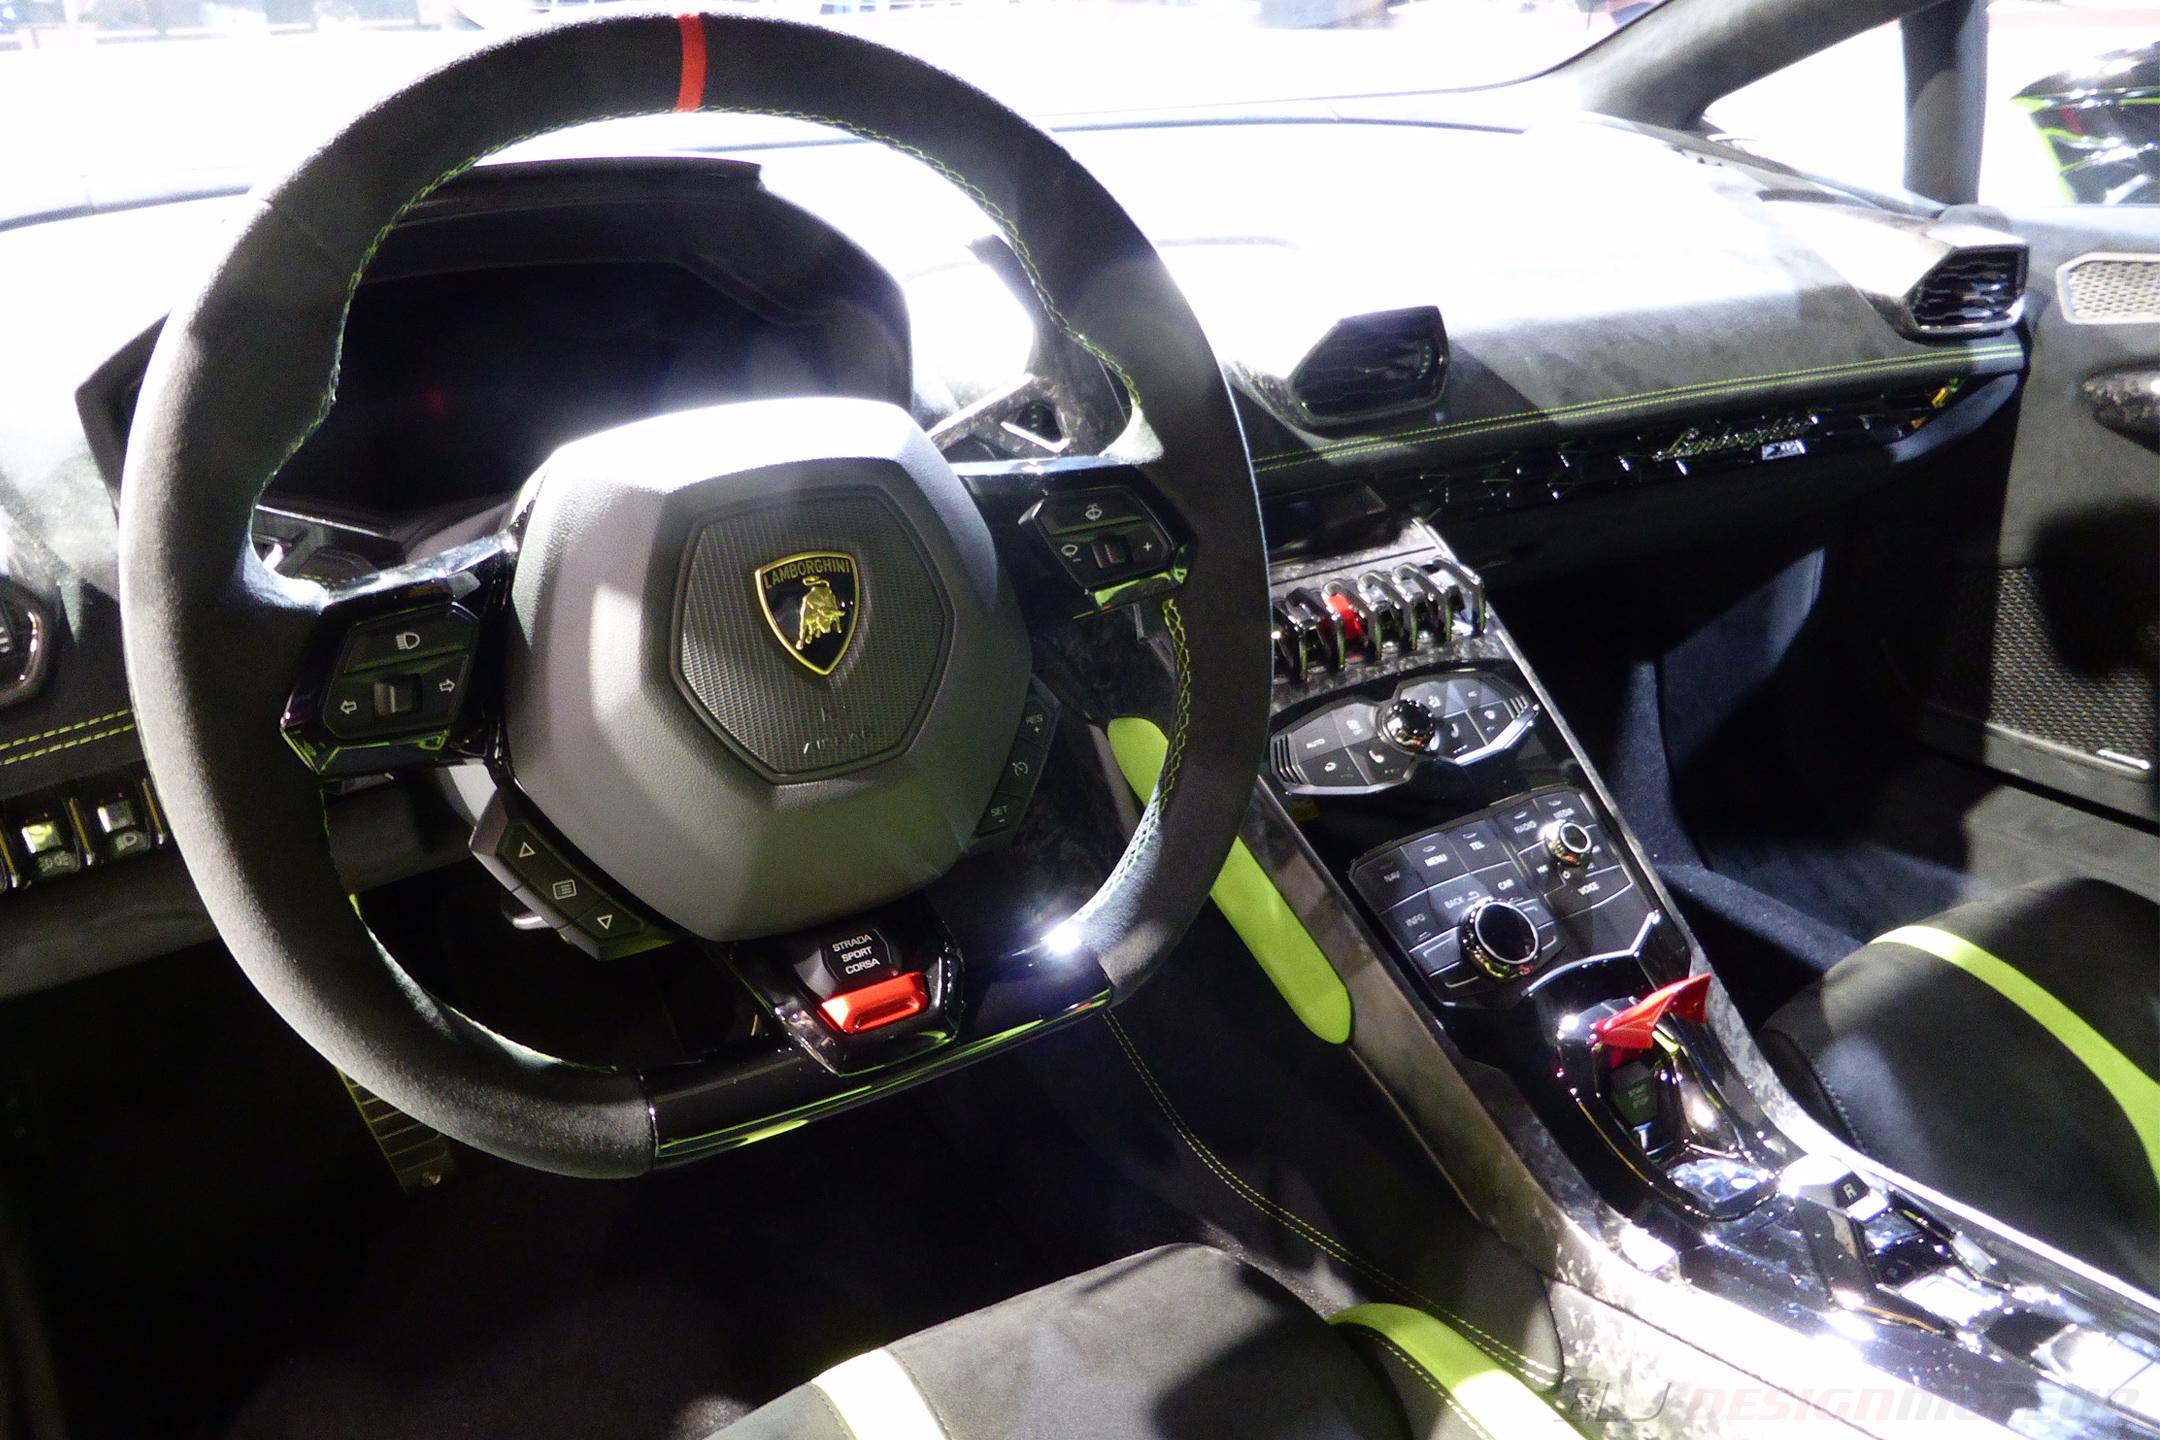 Lamborghini Huracán Performante - interior - Paris Motor Show - 2018 - Mondial Auto - photo ELJ DESIGNMOTEUR